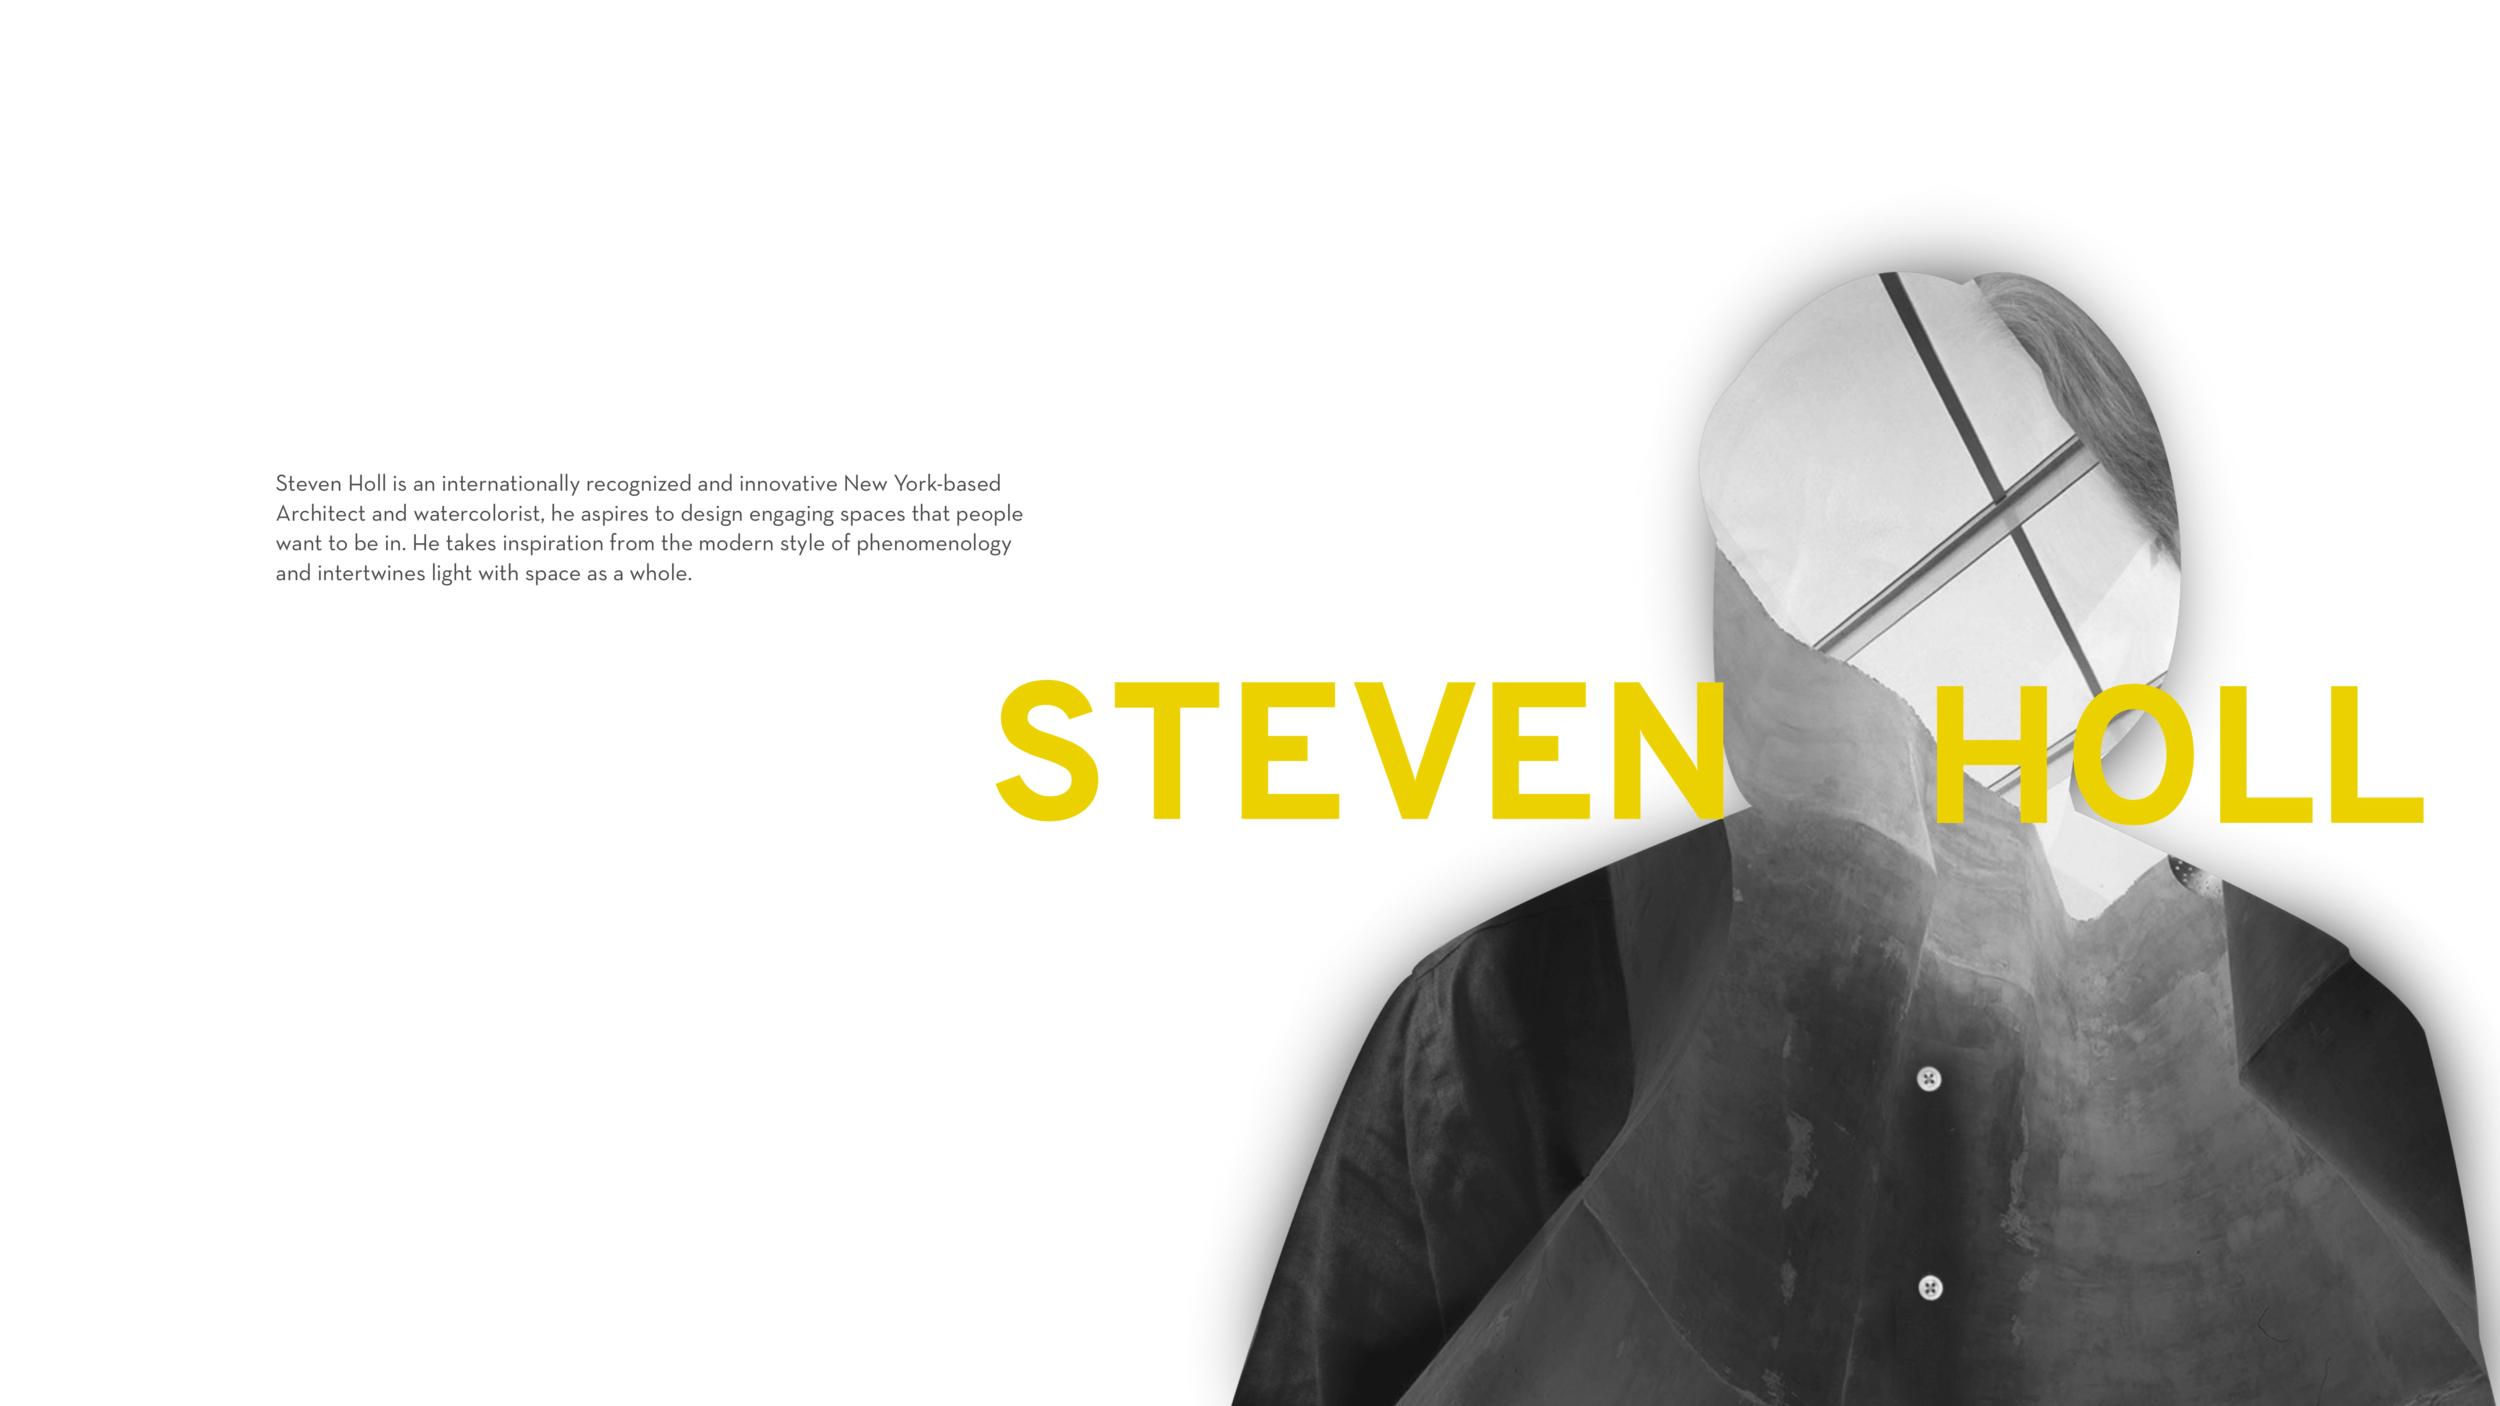 StevenHoll_Slides-05.png